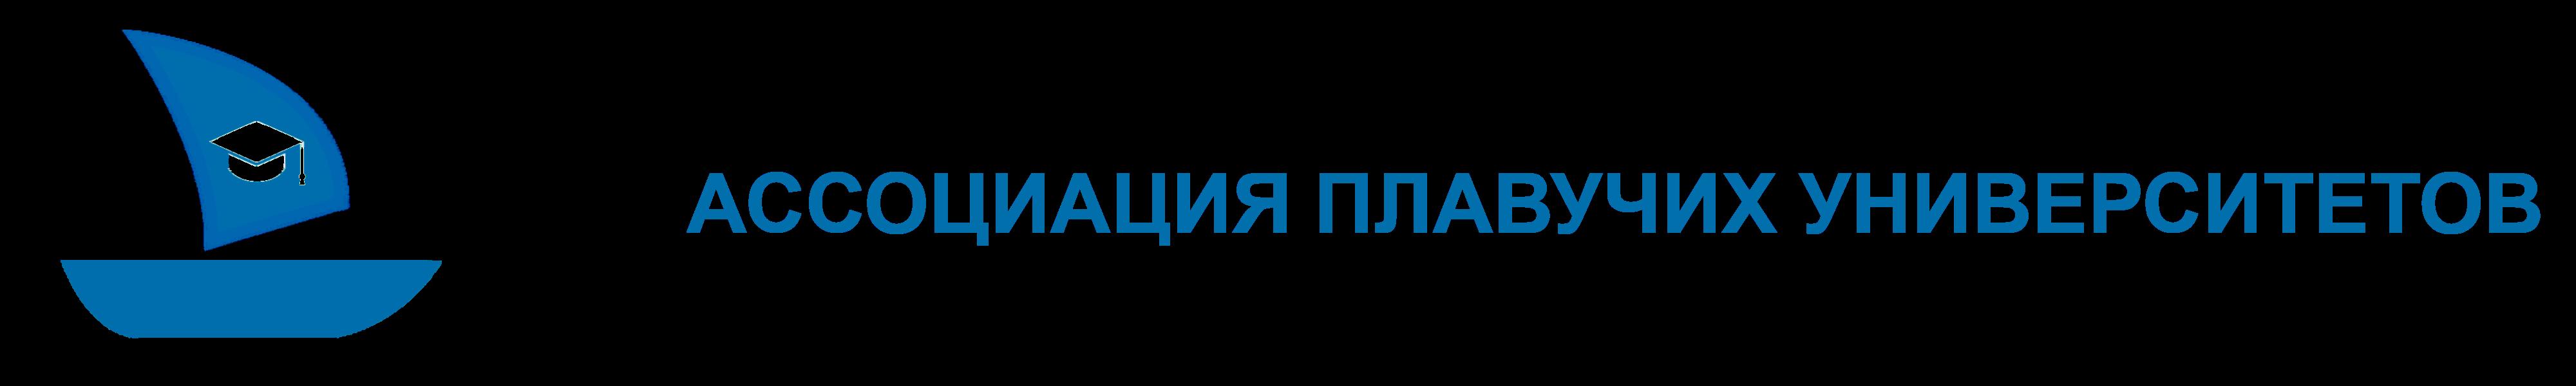 Ассоциация плавучих университетов